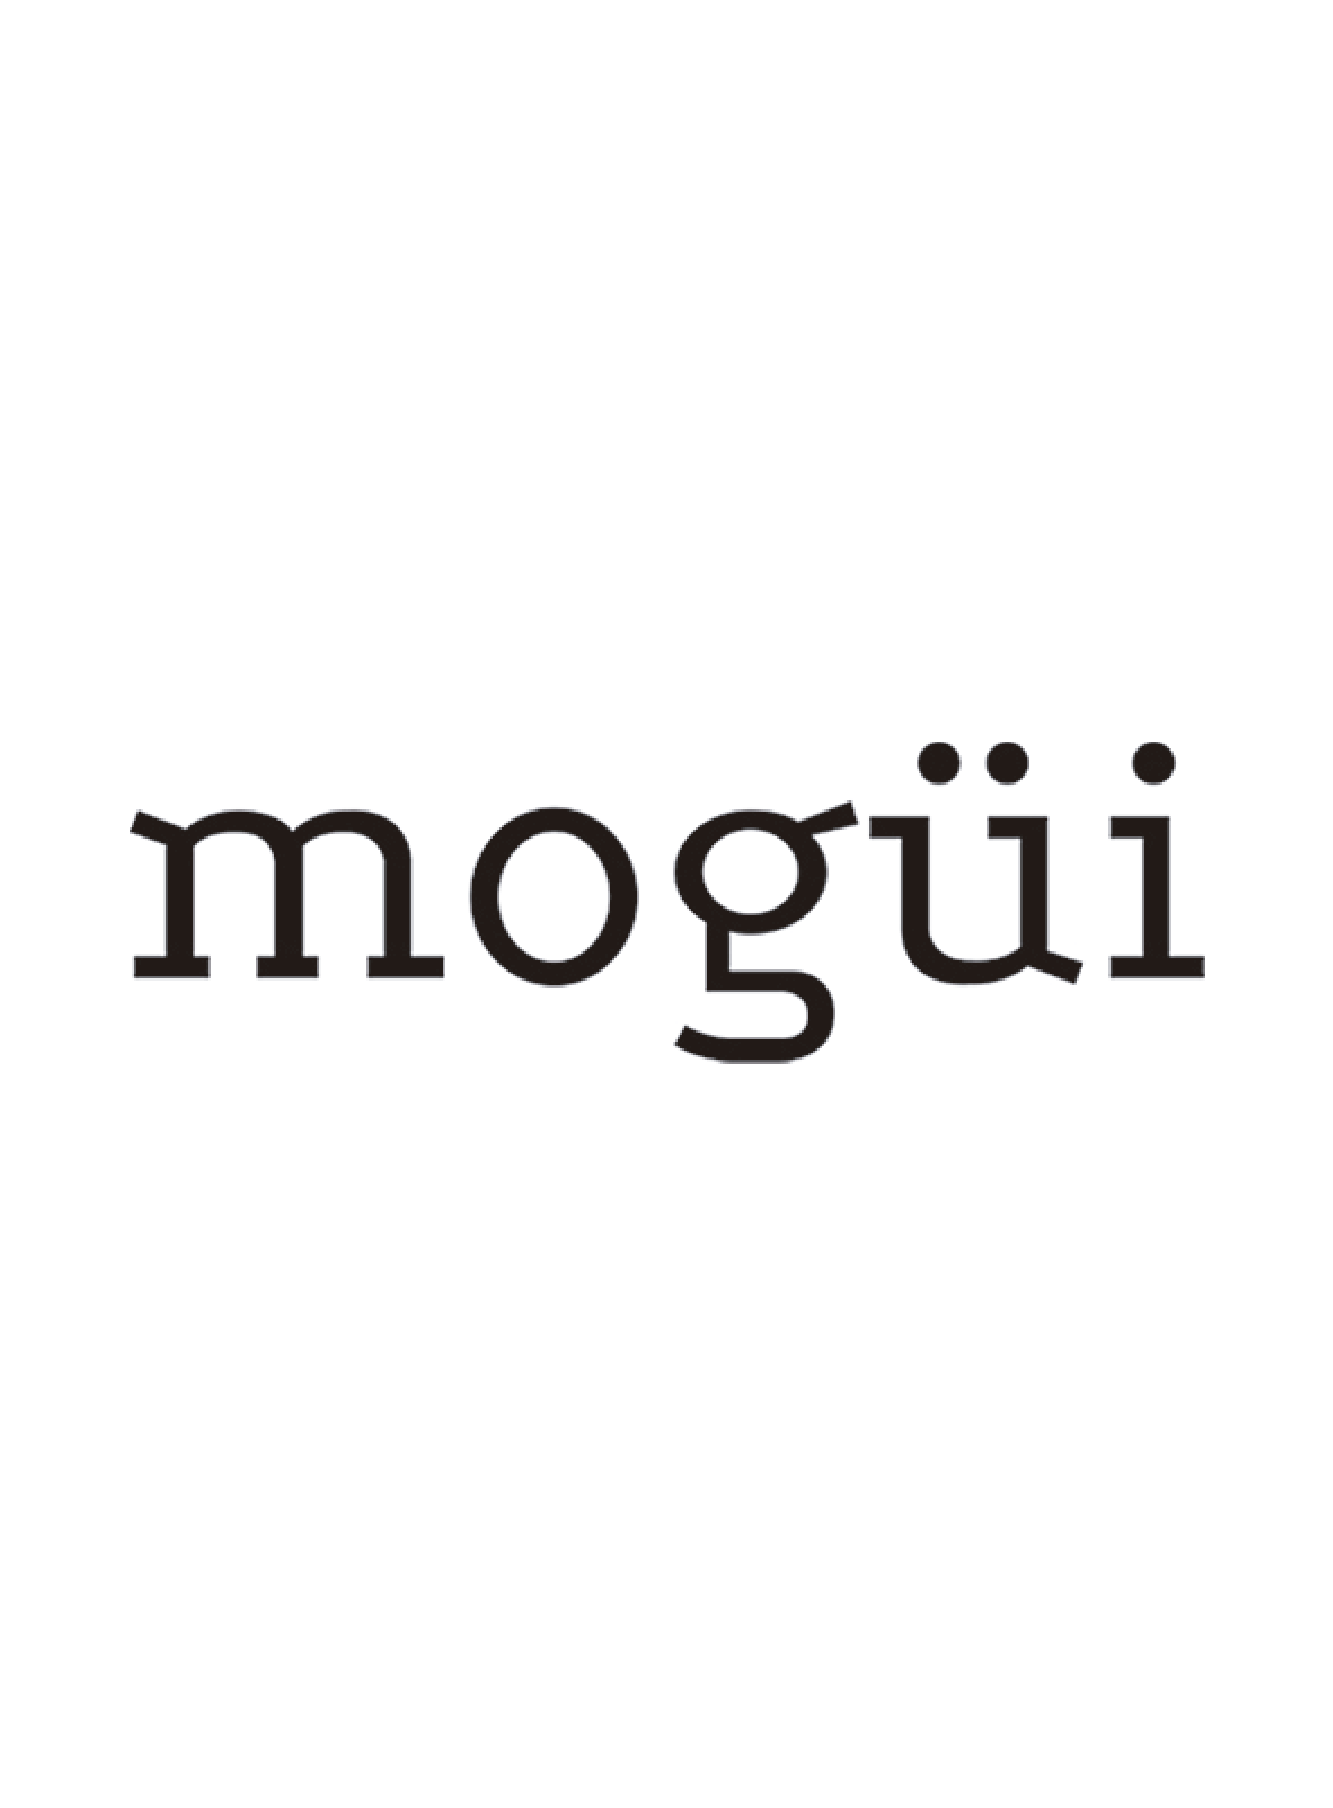 mogui_perfil